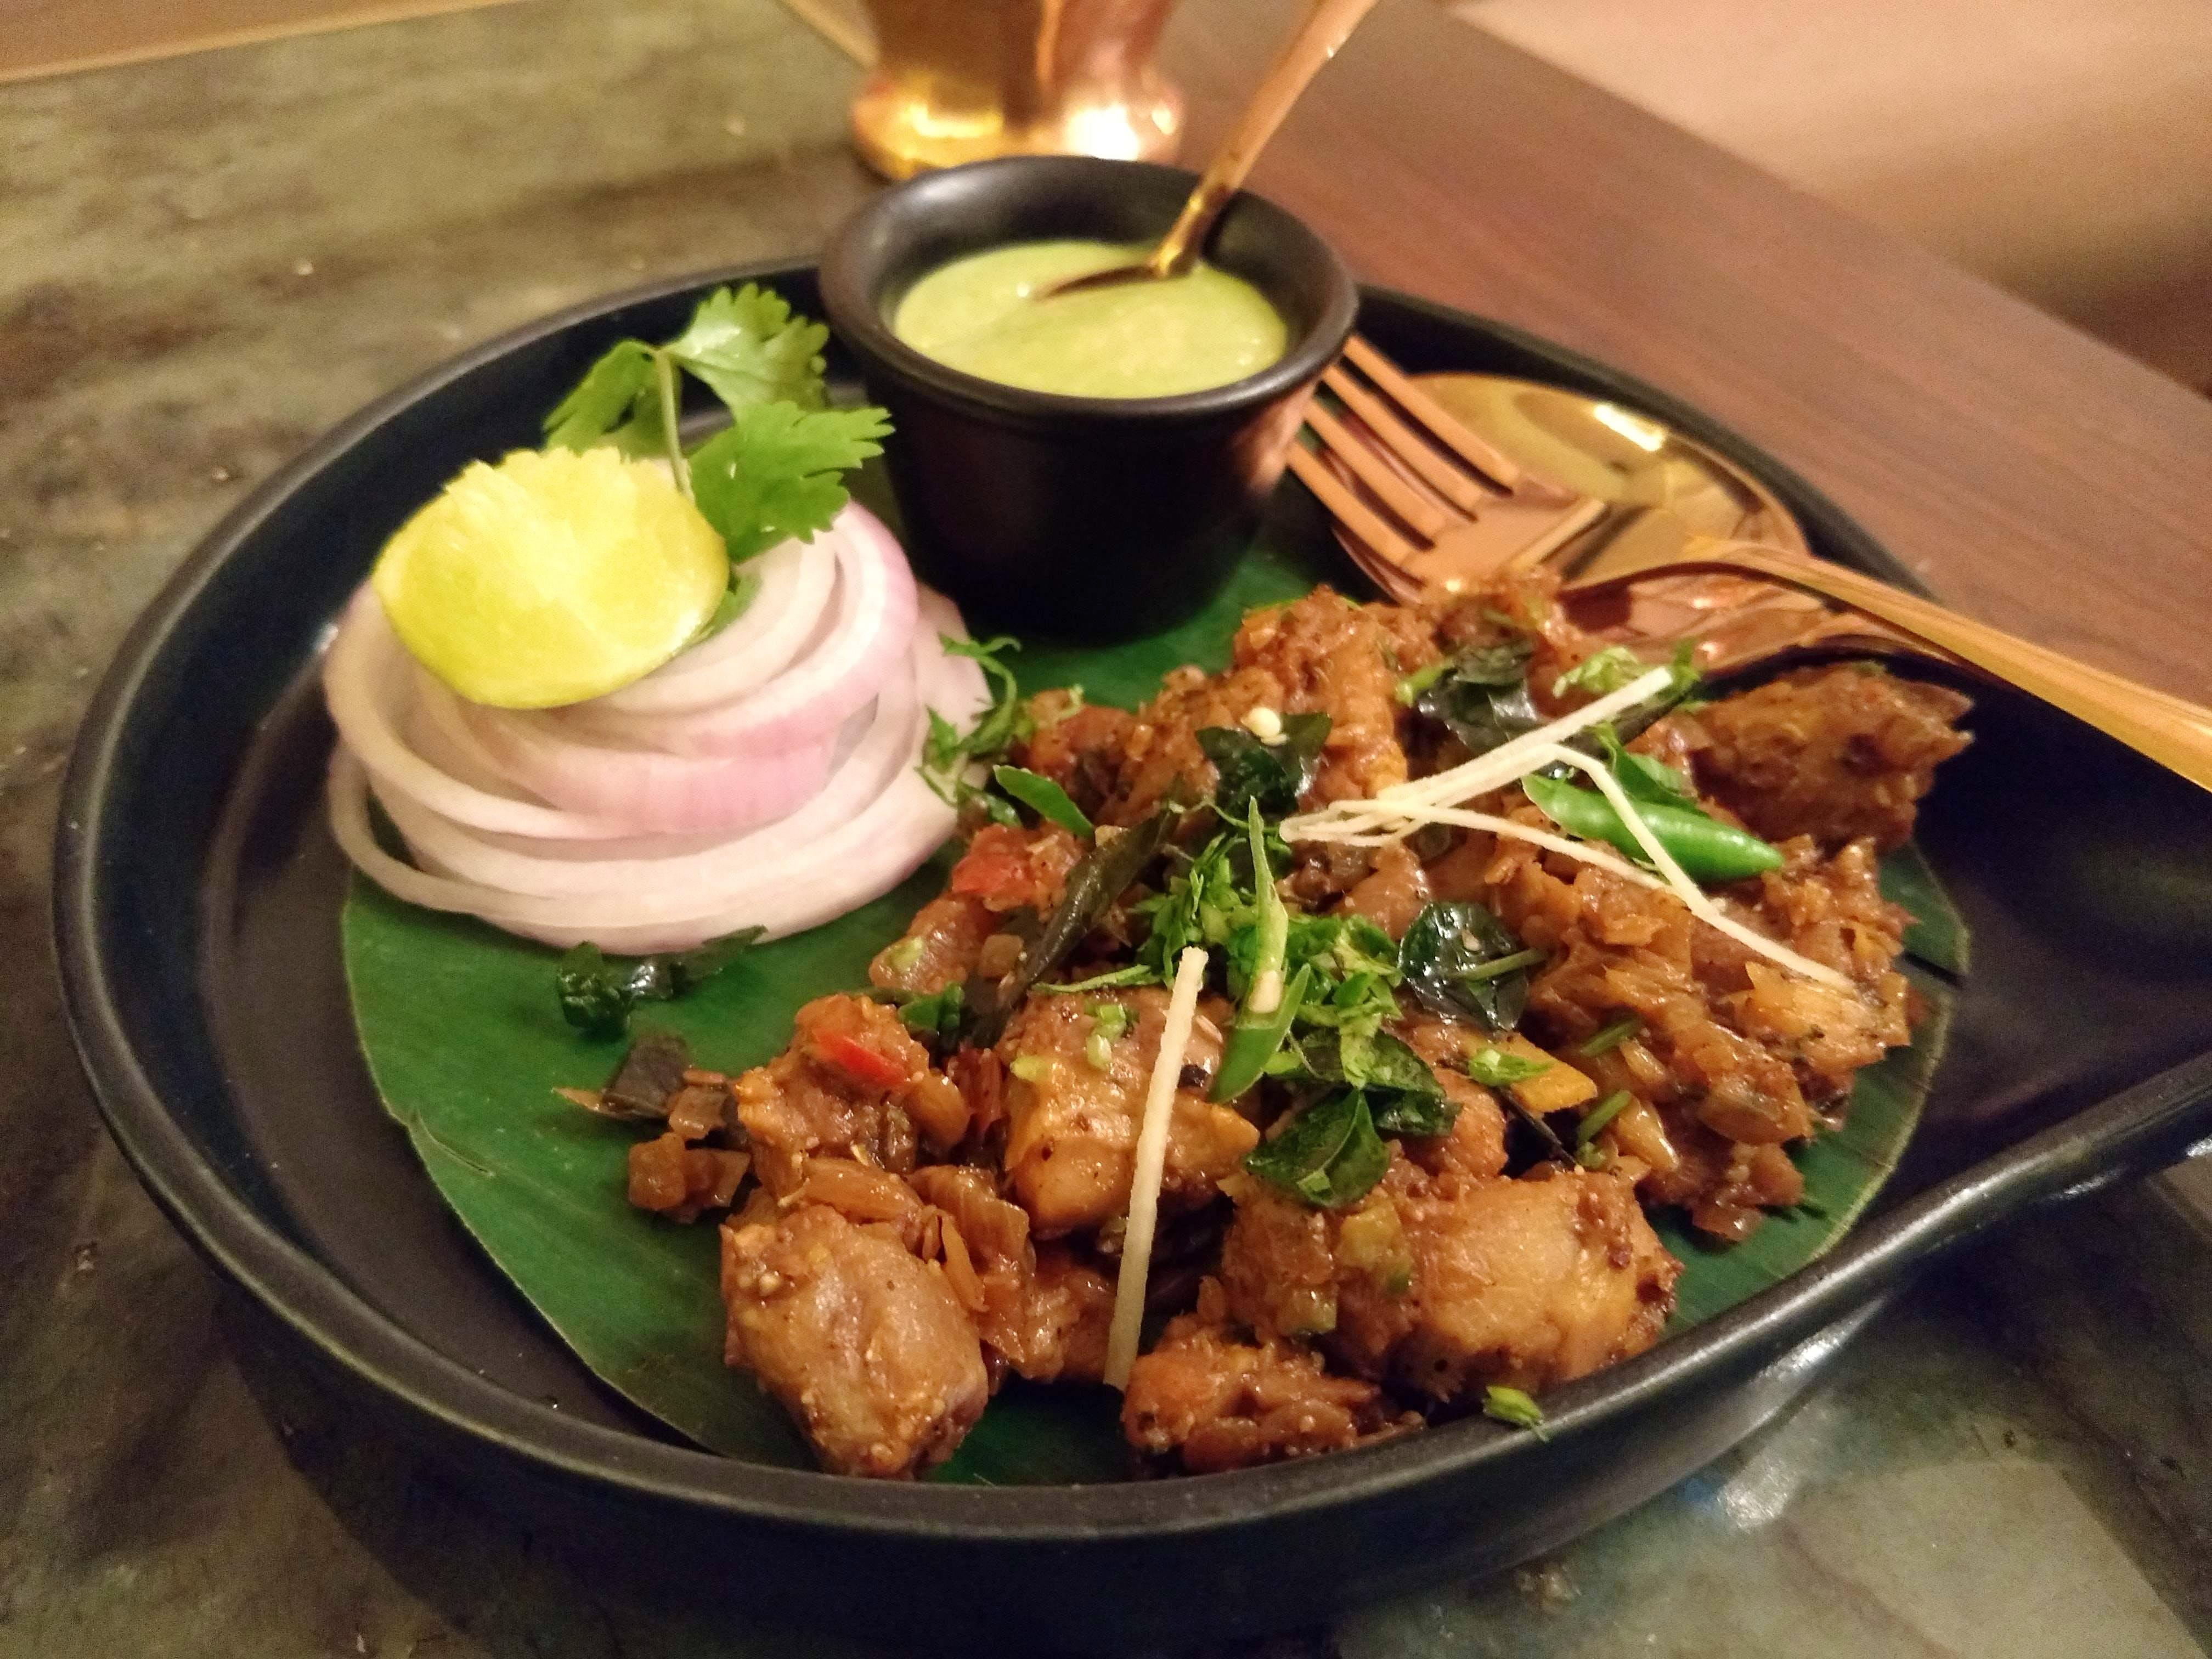 Dish,Food,Cuisine,Fried food,Ingredient,Karaage,Meal,Chicken meat,Meat,Produce